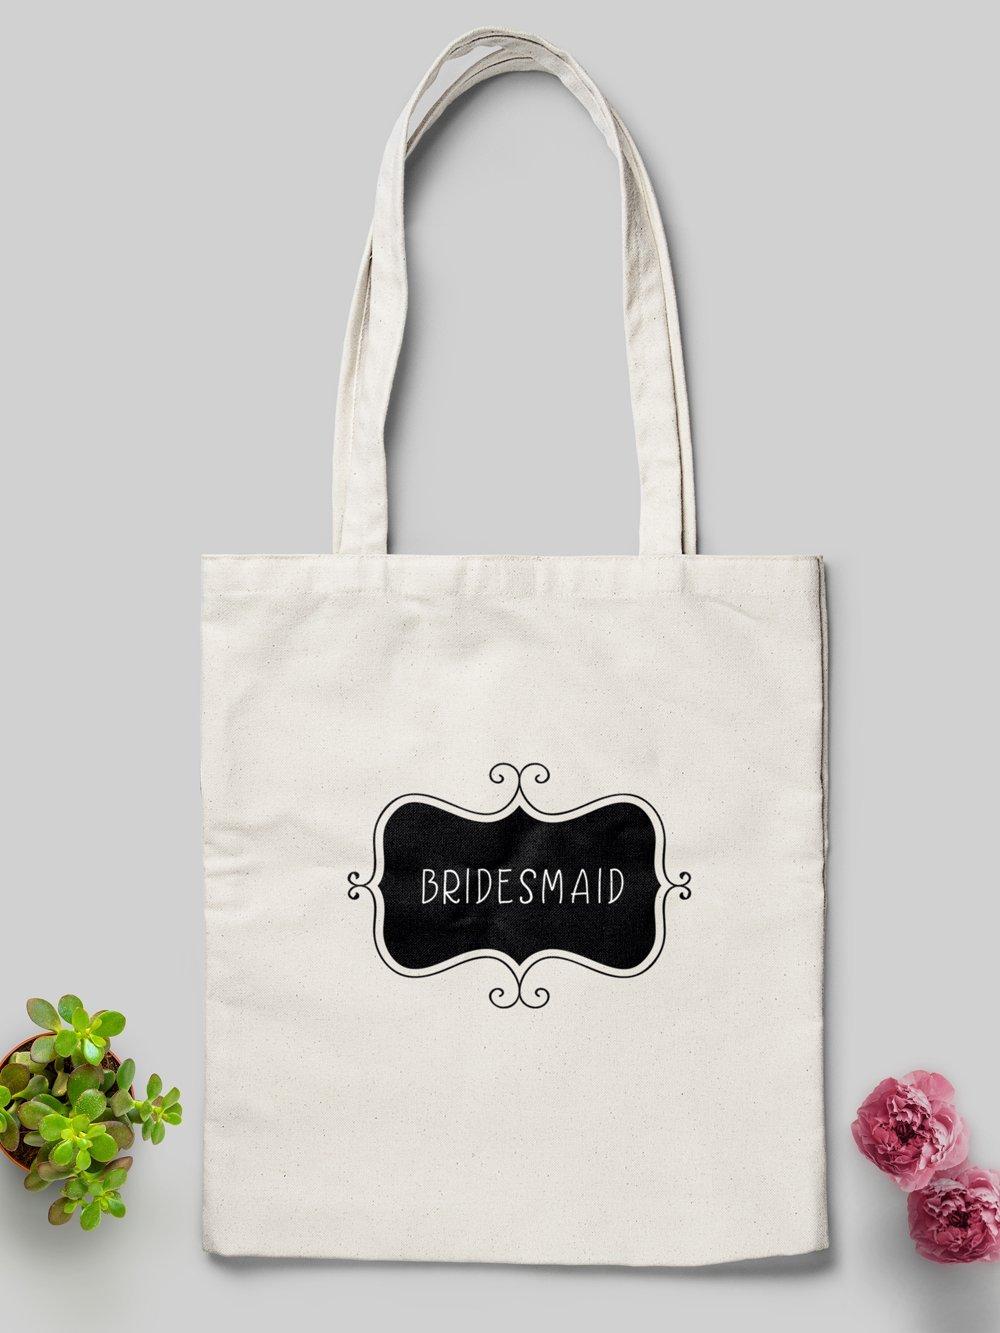 Bulk Custom Tote Bags - 10x Personalised or Set Design - Perfect Wedding Bags or Tote Bags for Bridesmaids, Parties or Events - handmade-bags